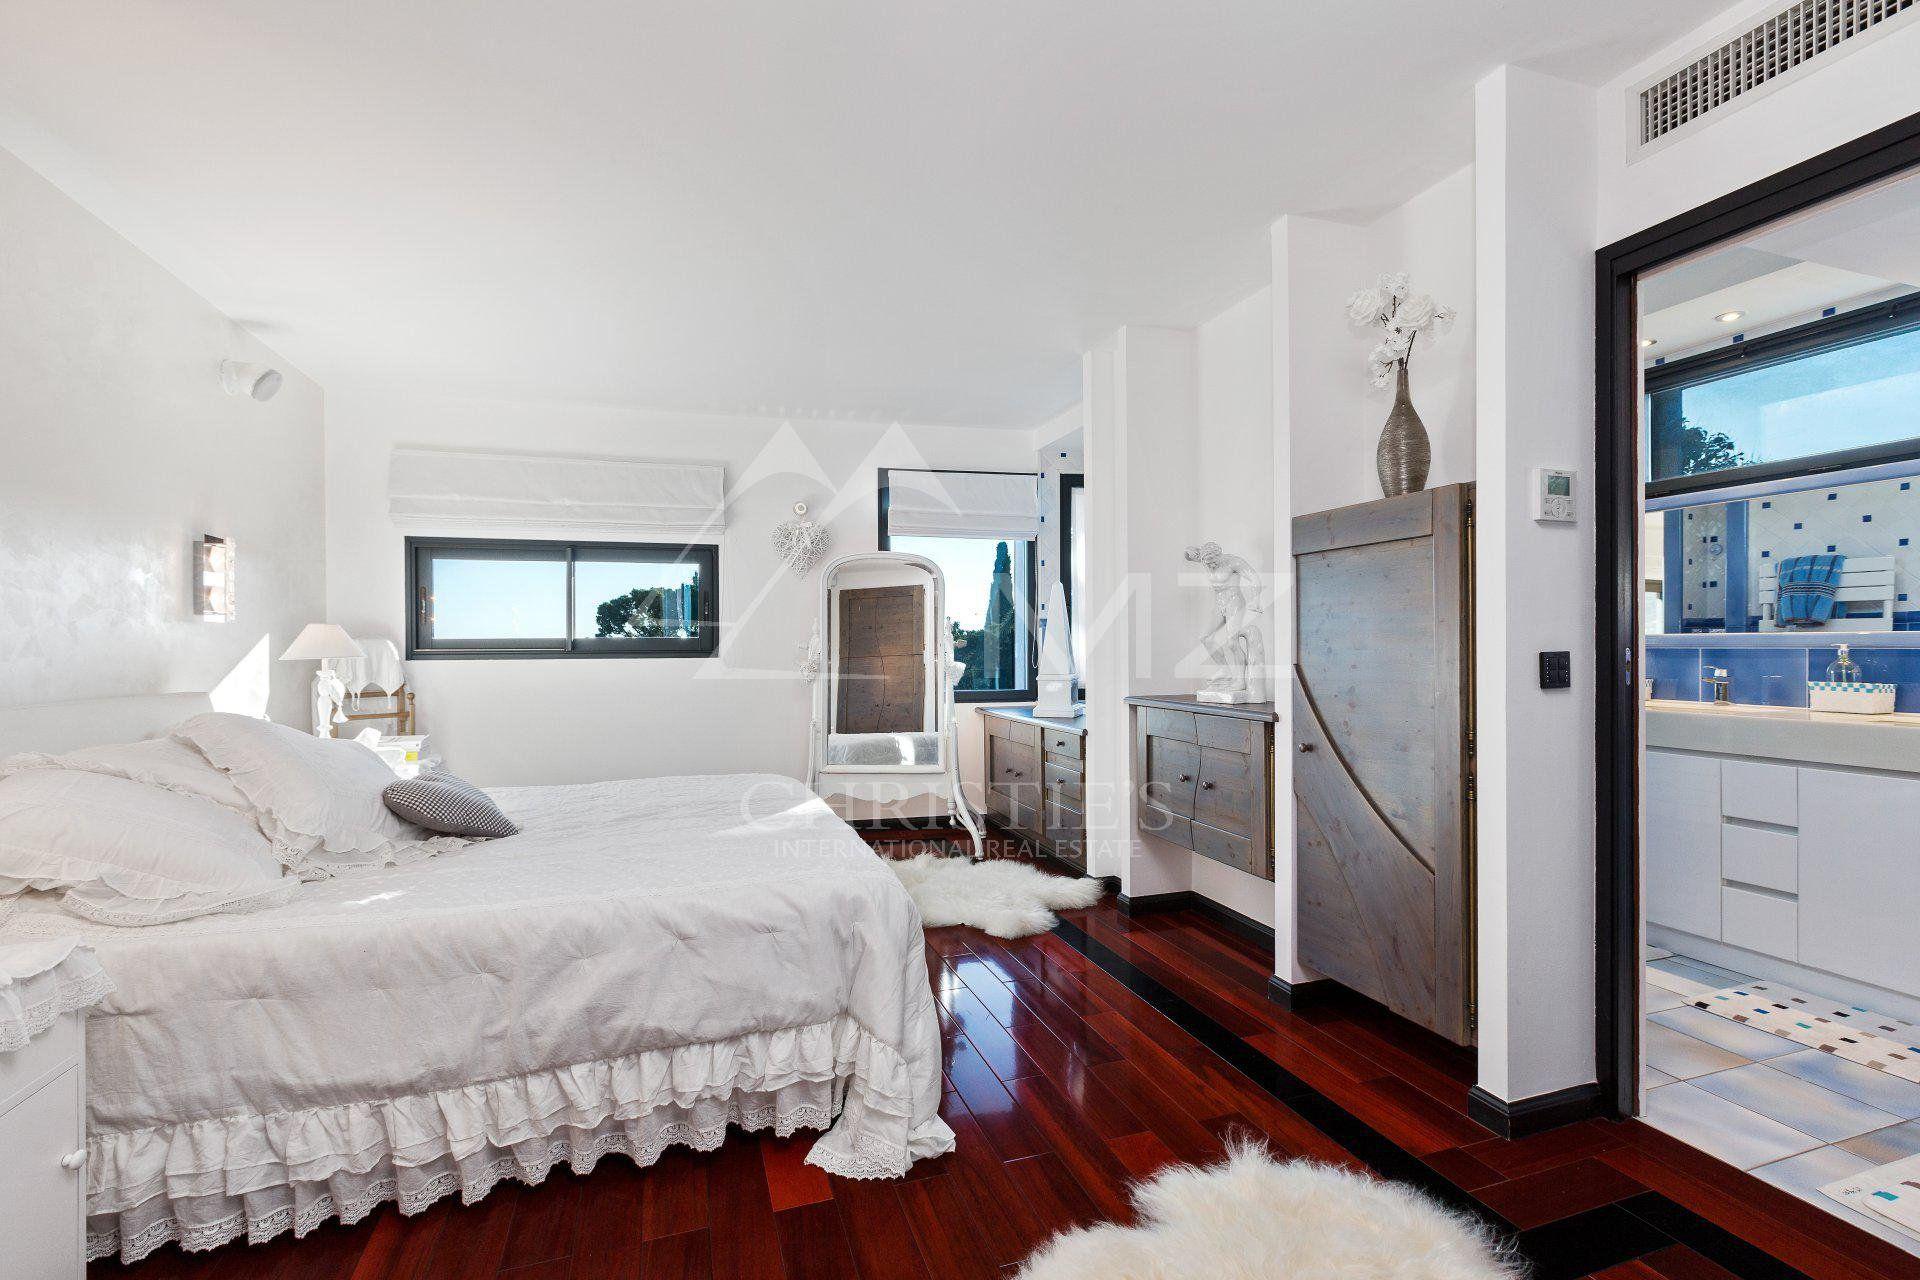 Proche Cannes - villa d'architecte neuve